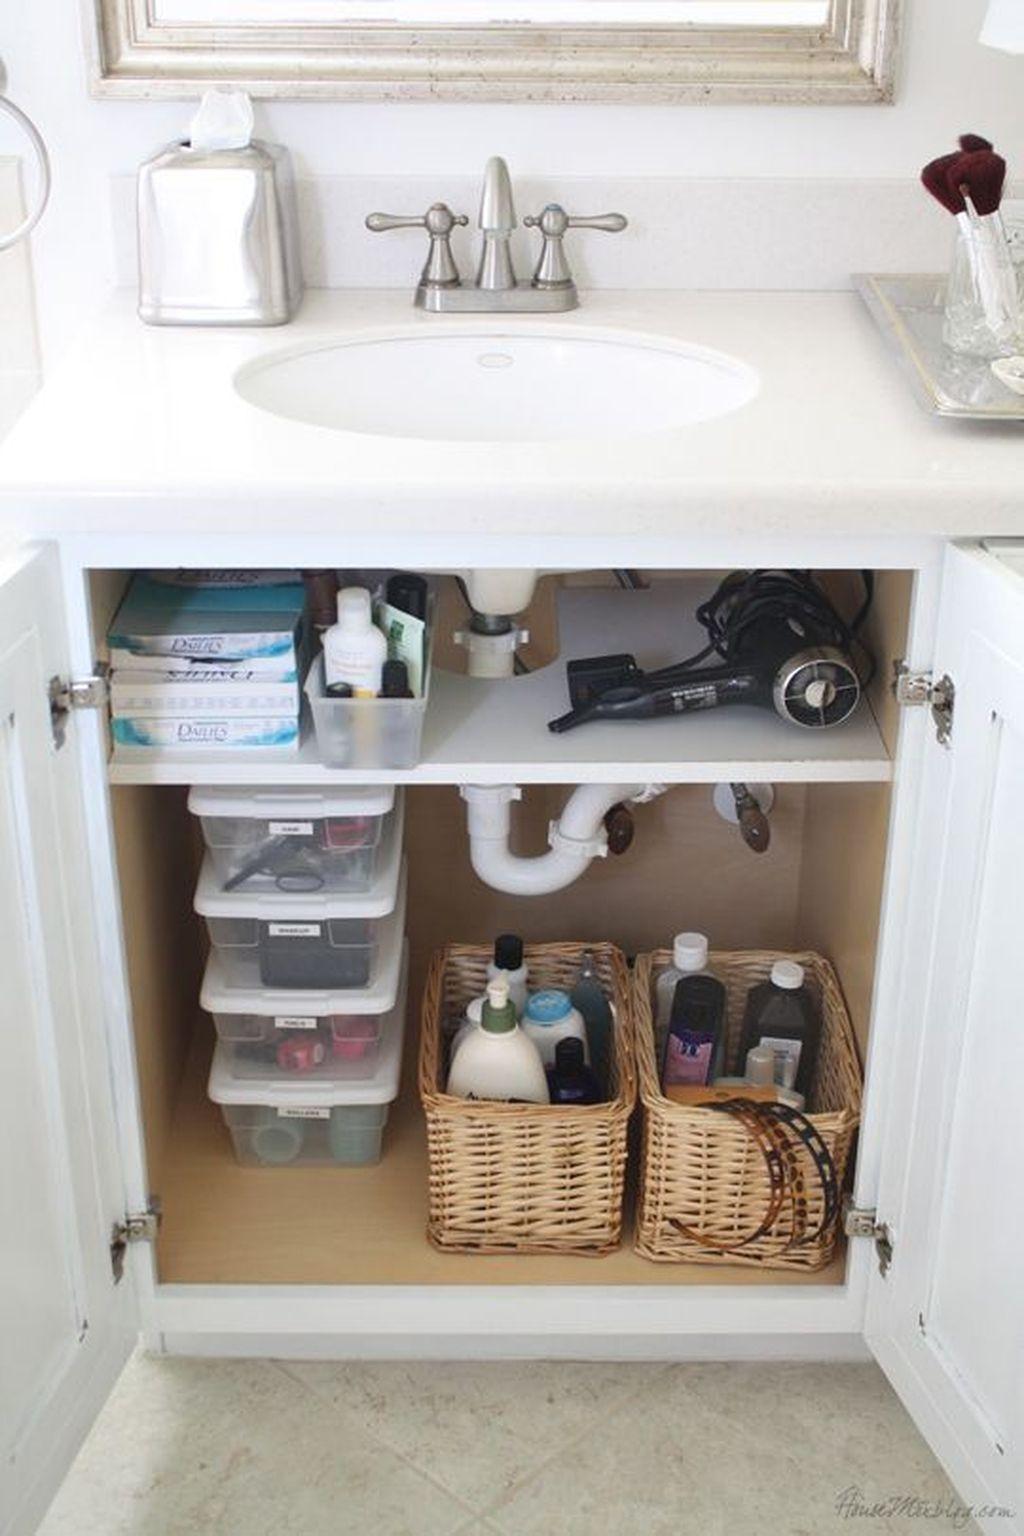 60 Inspiring Diy Small Bathroom Organization And Storage Ideas Extraordinary Small Bathroom Organization Decorating Inspiration